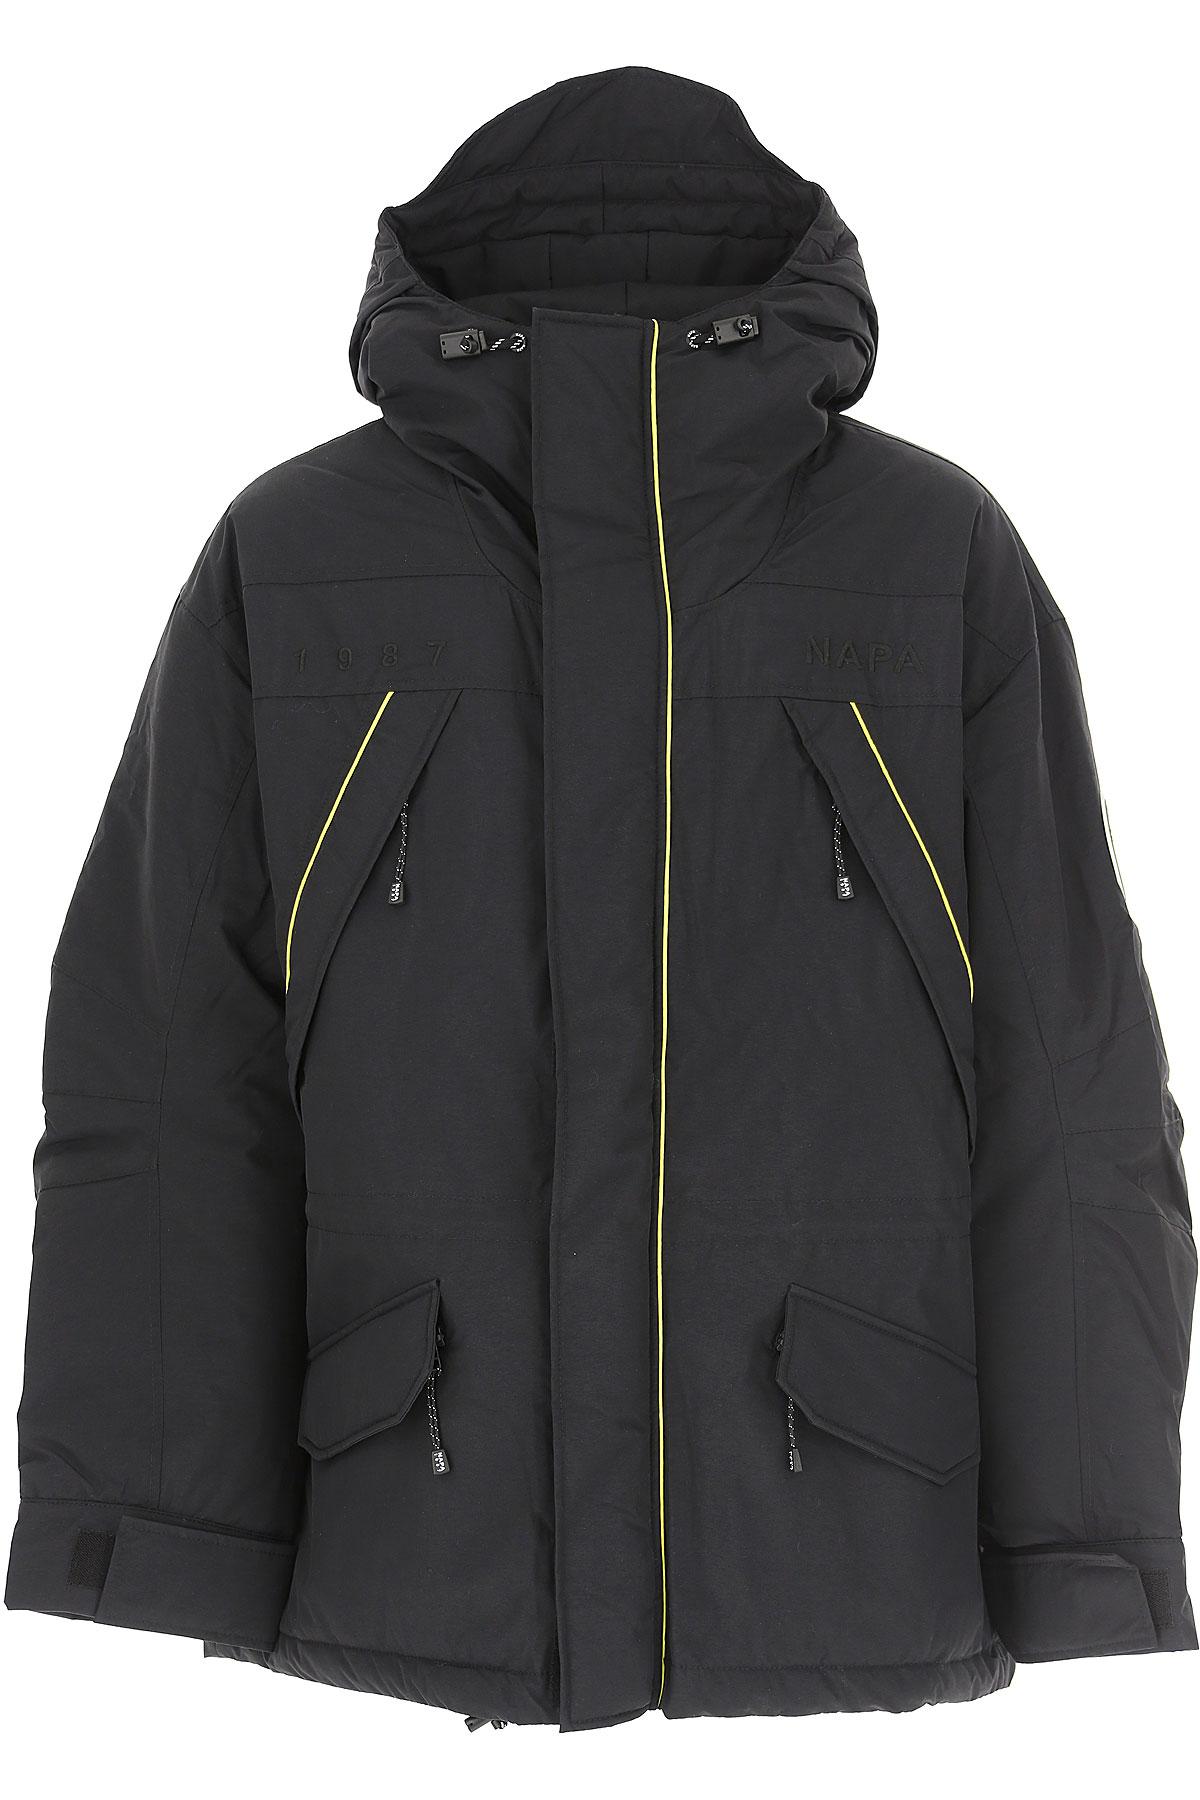 Napapijri Down Jacket for Men, Puffer Ski Jacket On Sale, Black, polyamide, 2019, L M S